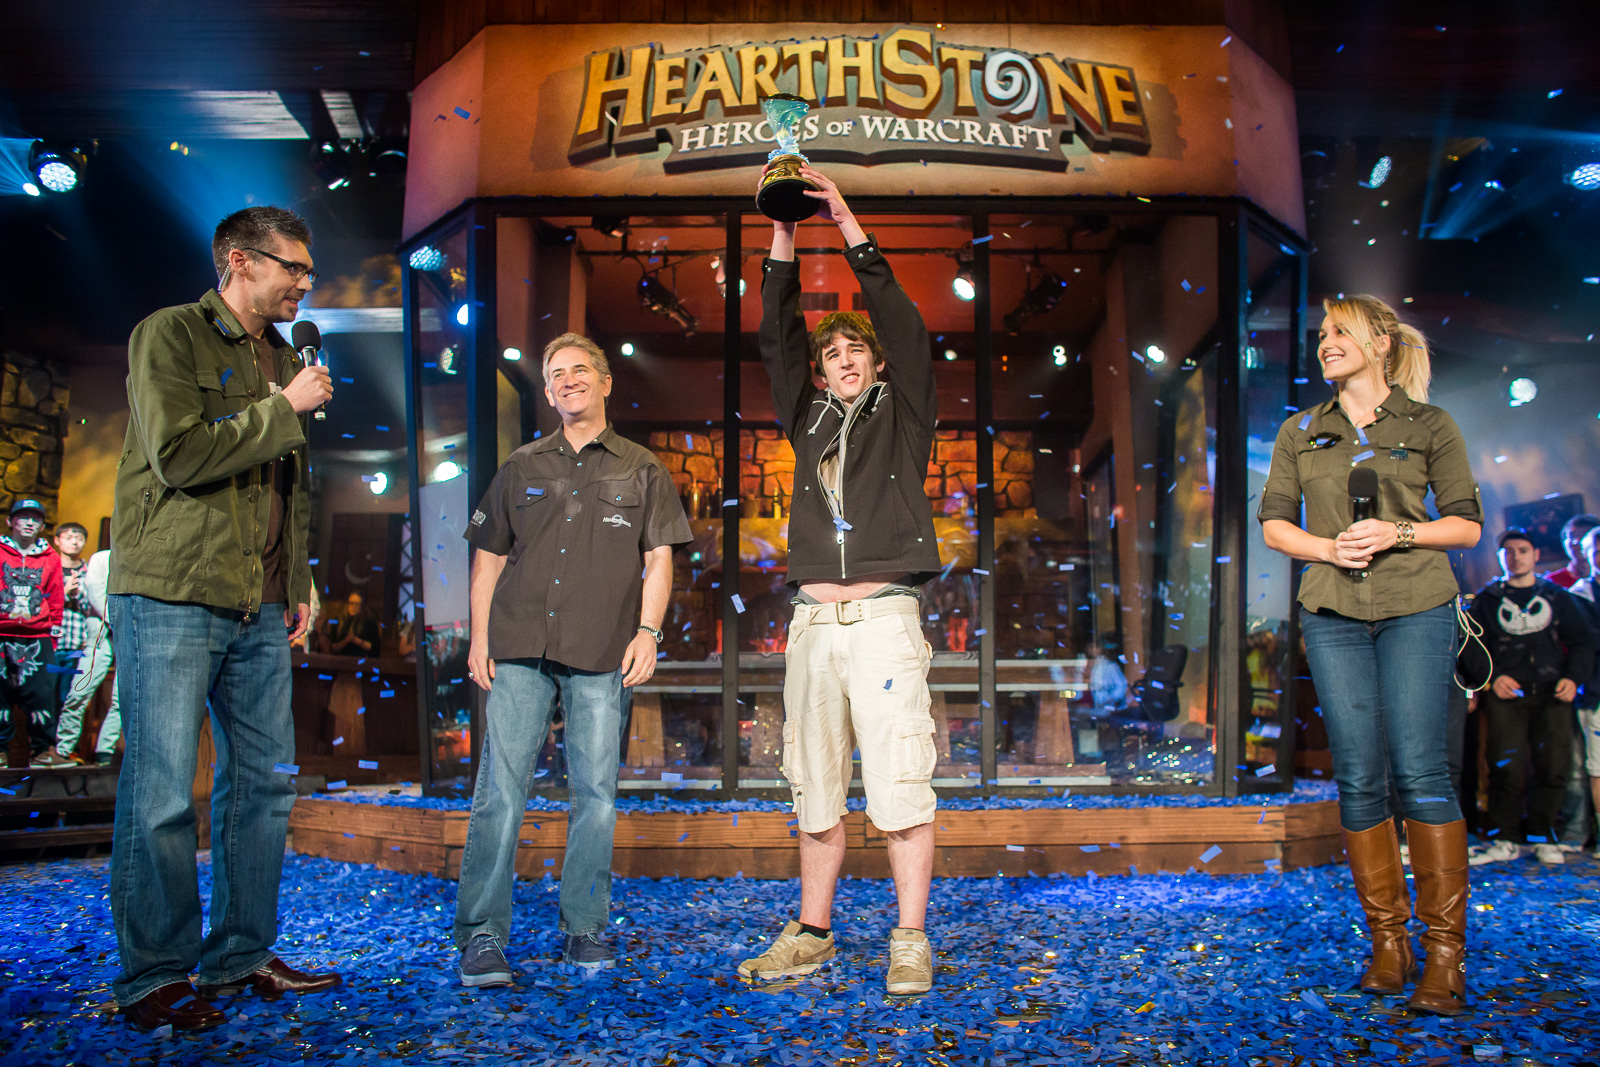 HearthStone 2014 BlizzCon winner James 'Firebat' Kostesich